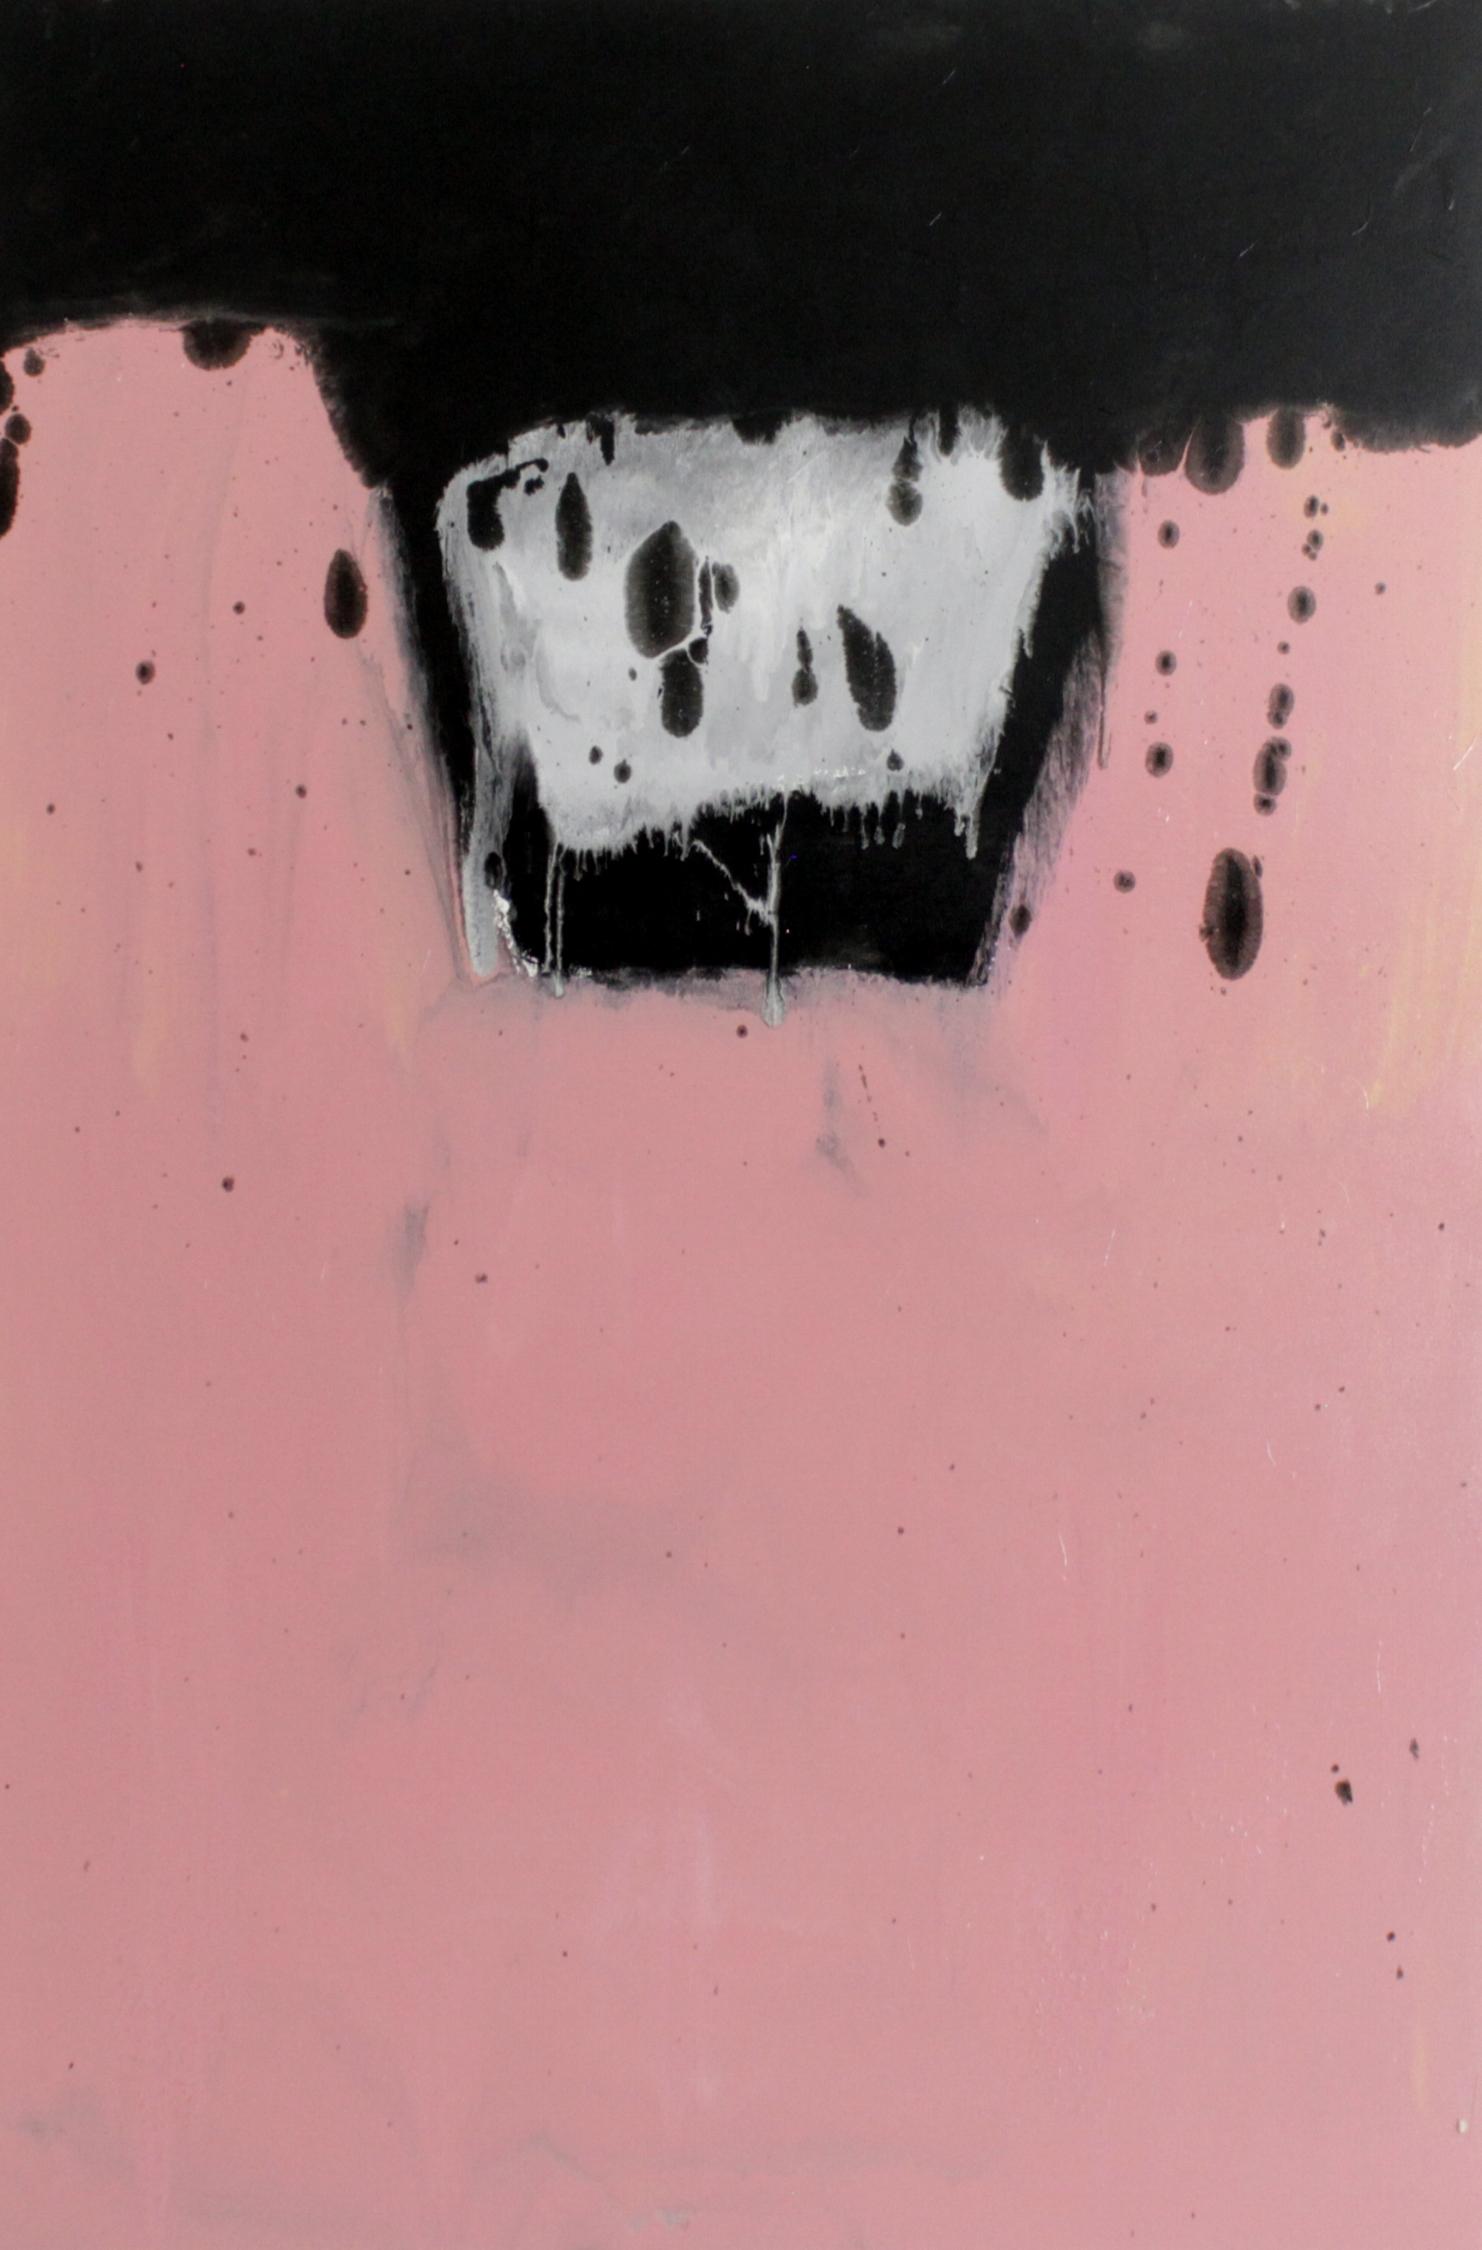 Untitled, 2016, enamel paint on canvas, 183 x 122 cm